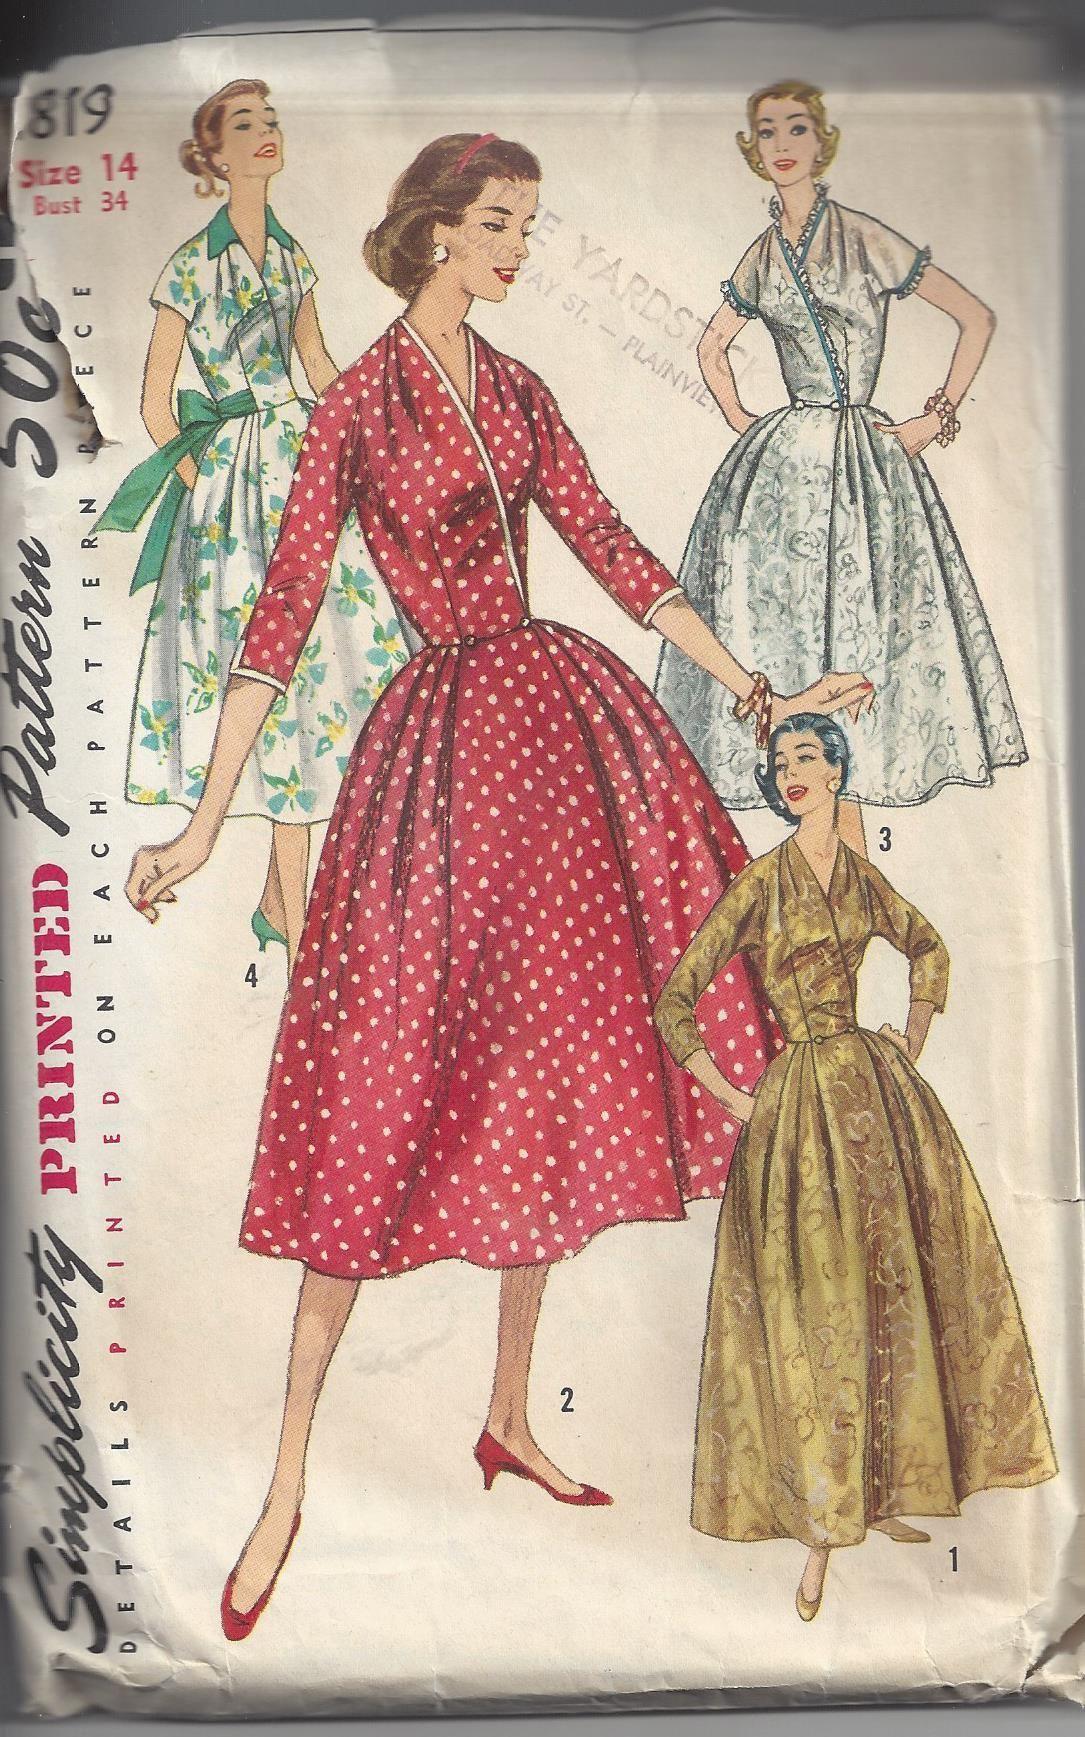 Momspatterns vintage sewing patterns simplicity vintage us